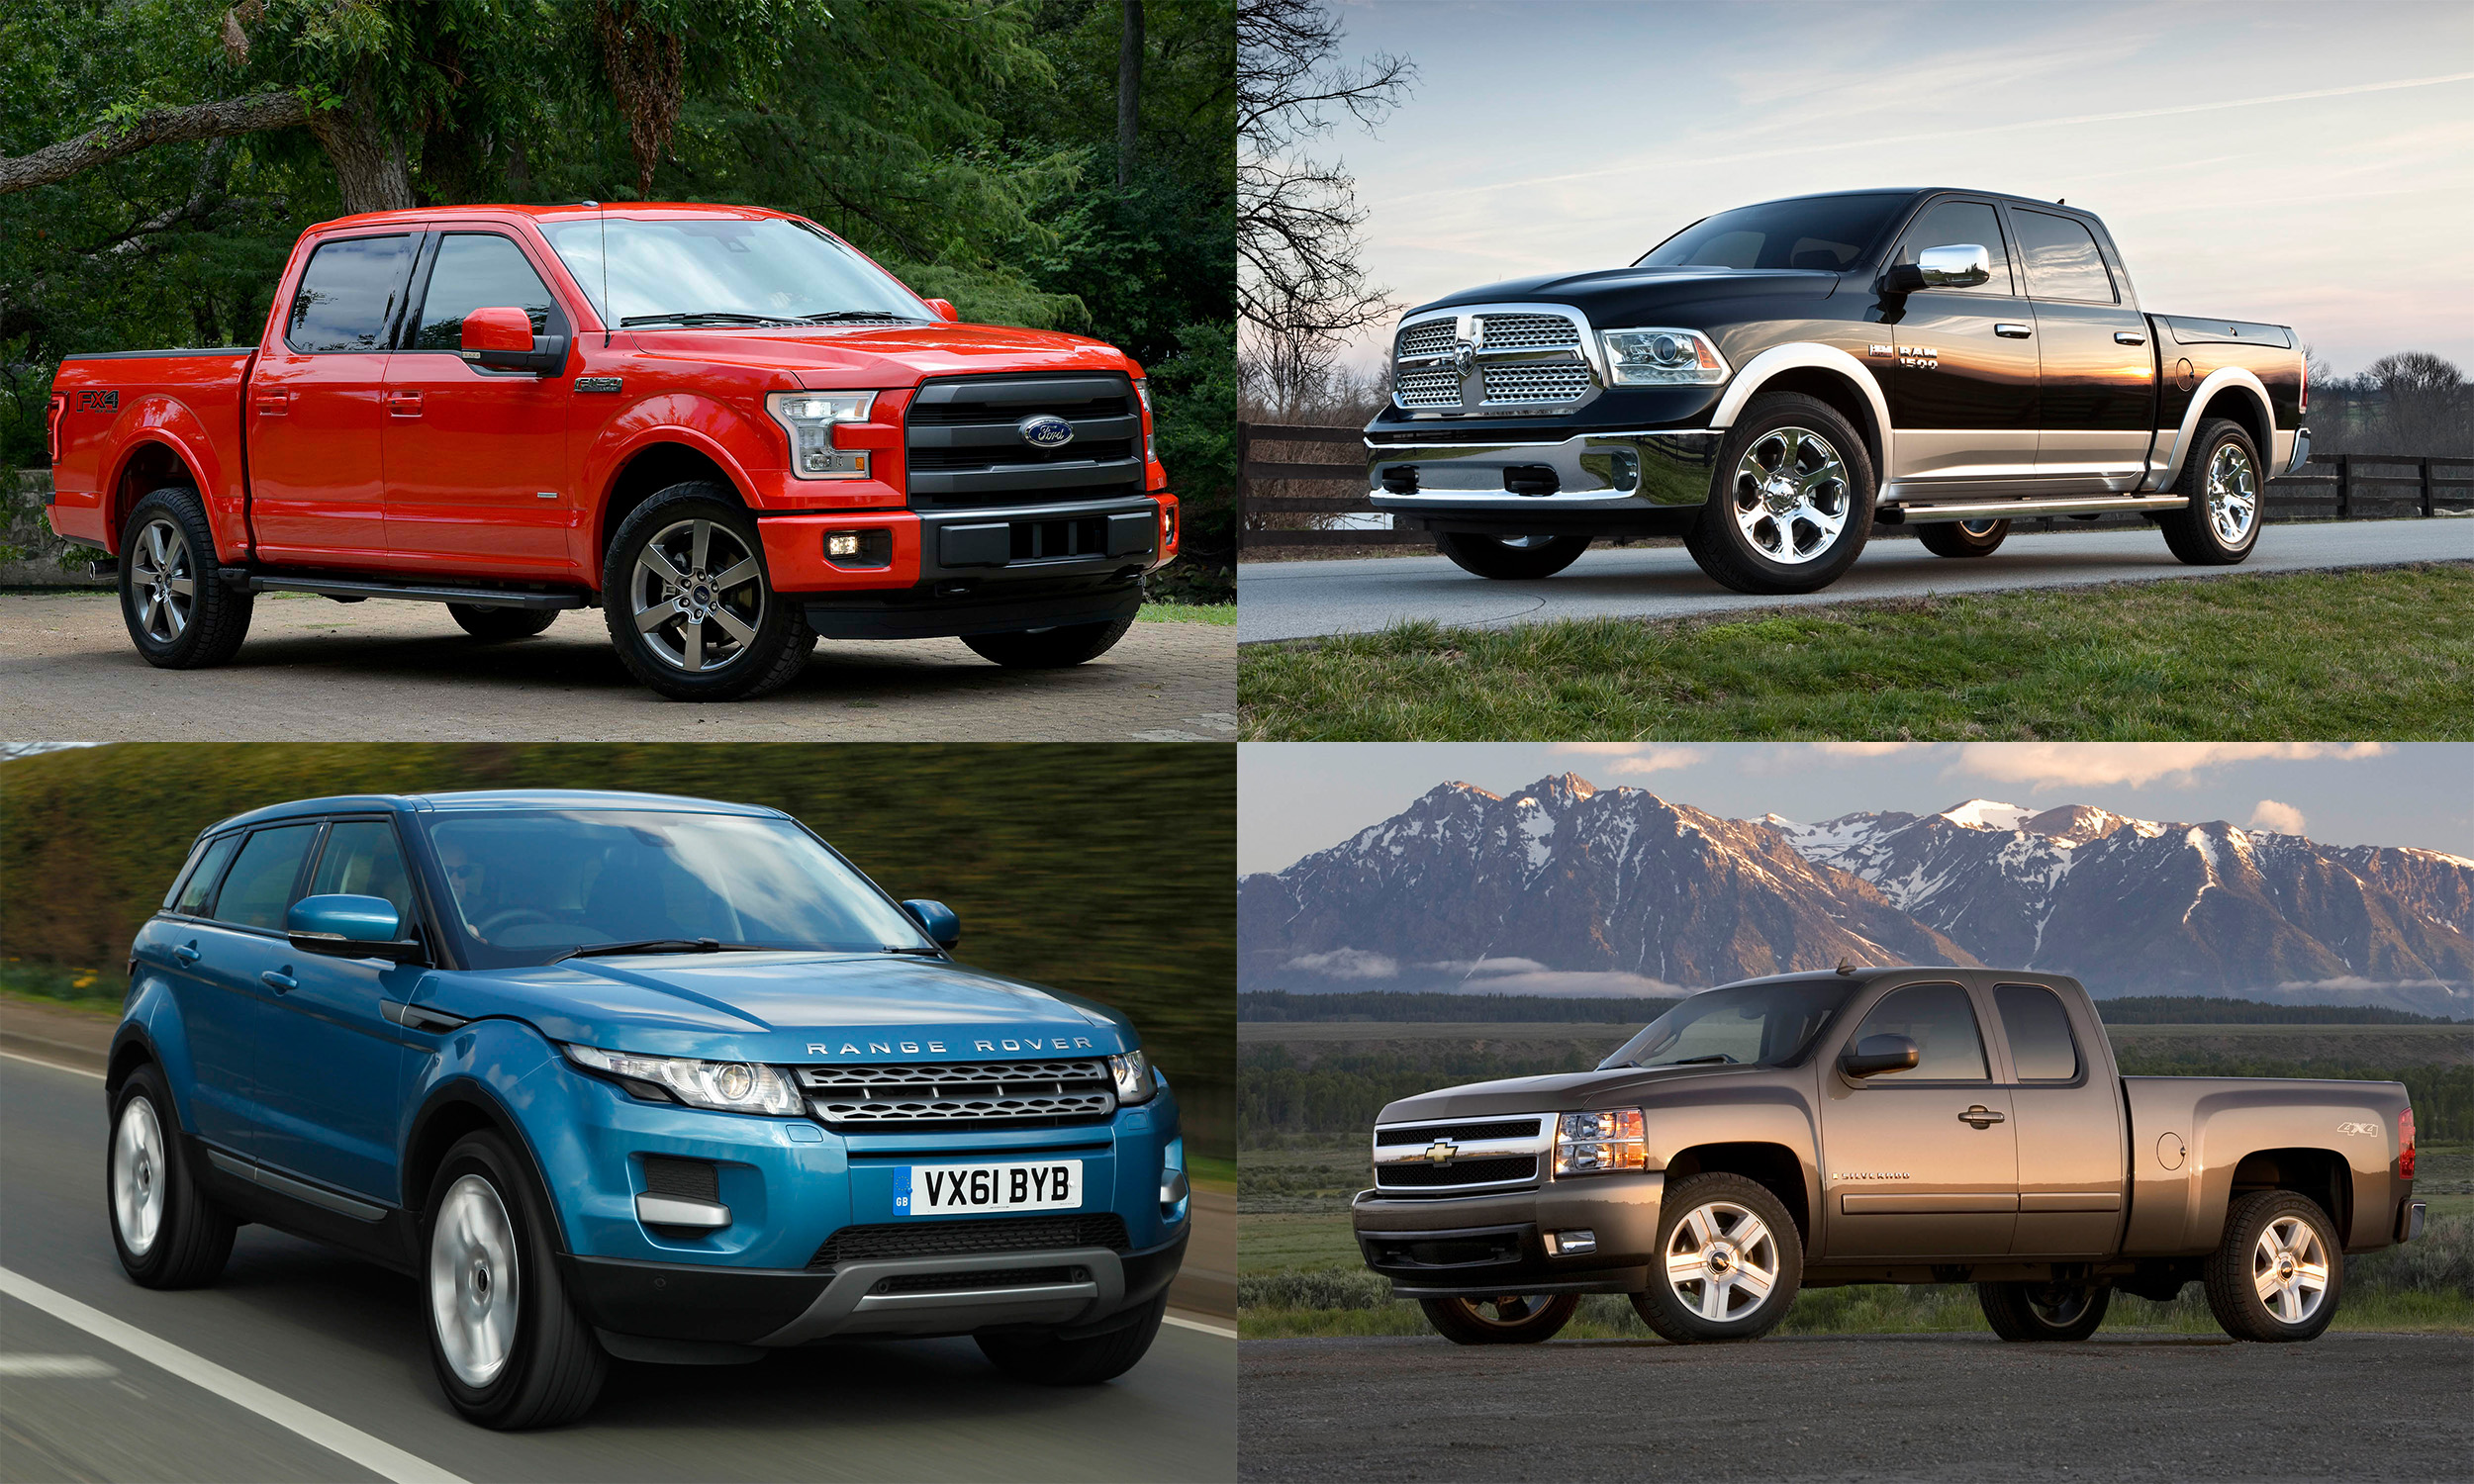 © Ford Motor Company; FCA US LLC; General Motors; Jaguar Land Rover North America